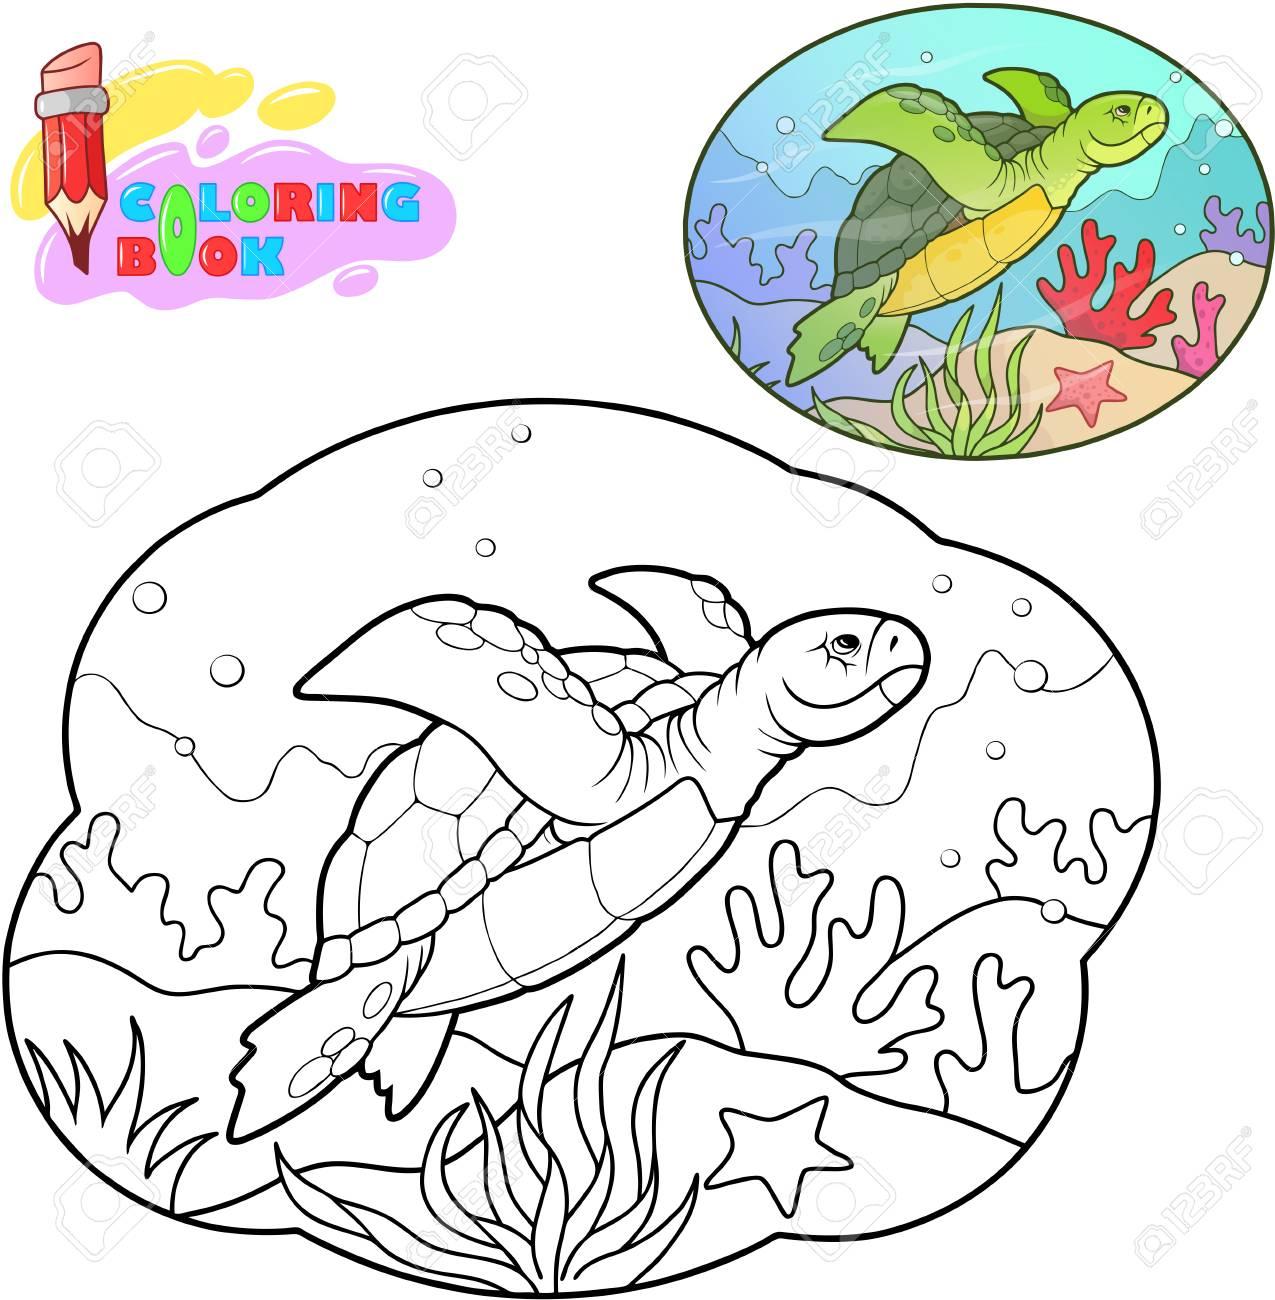 Cute Cartoon Sea Turtle Coloring Book Funny Illustration Royalty